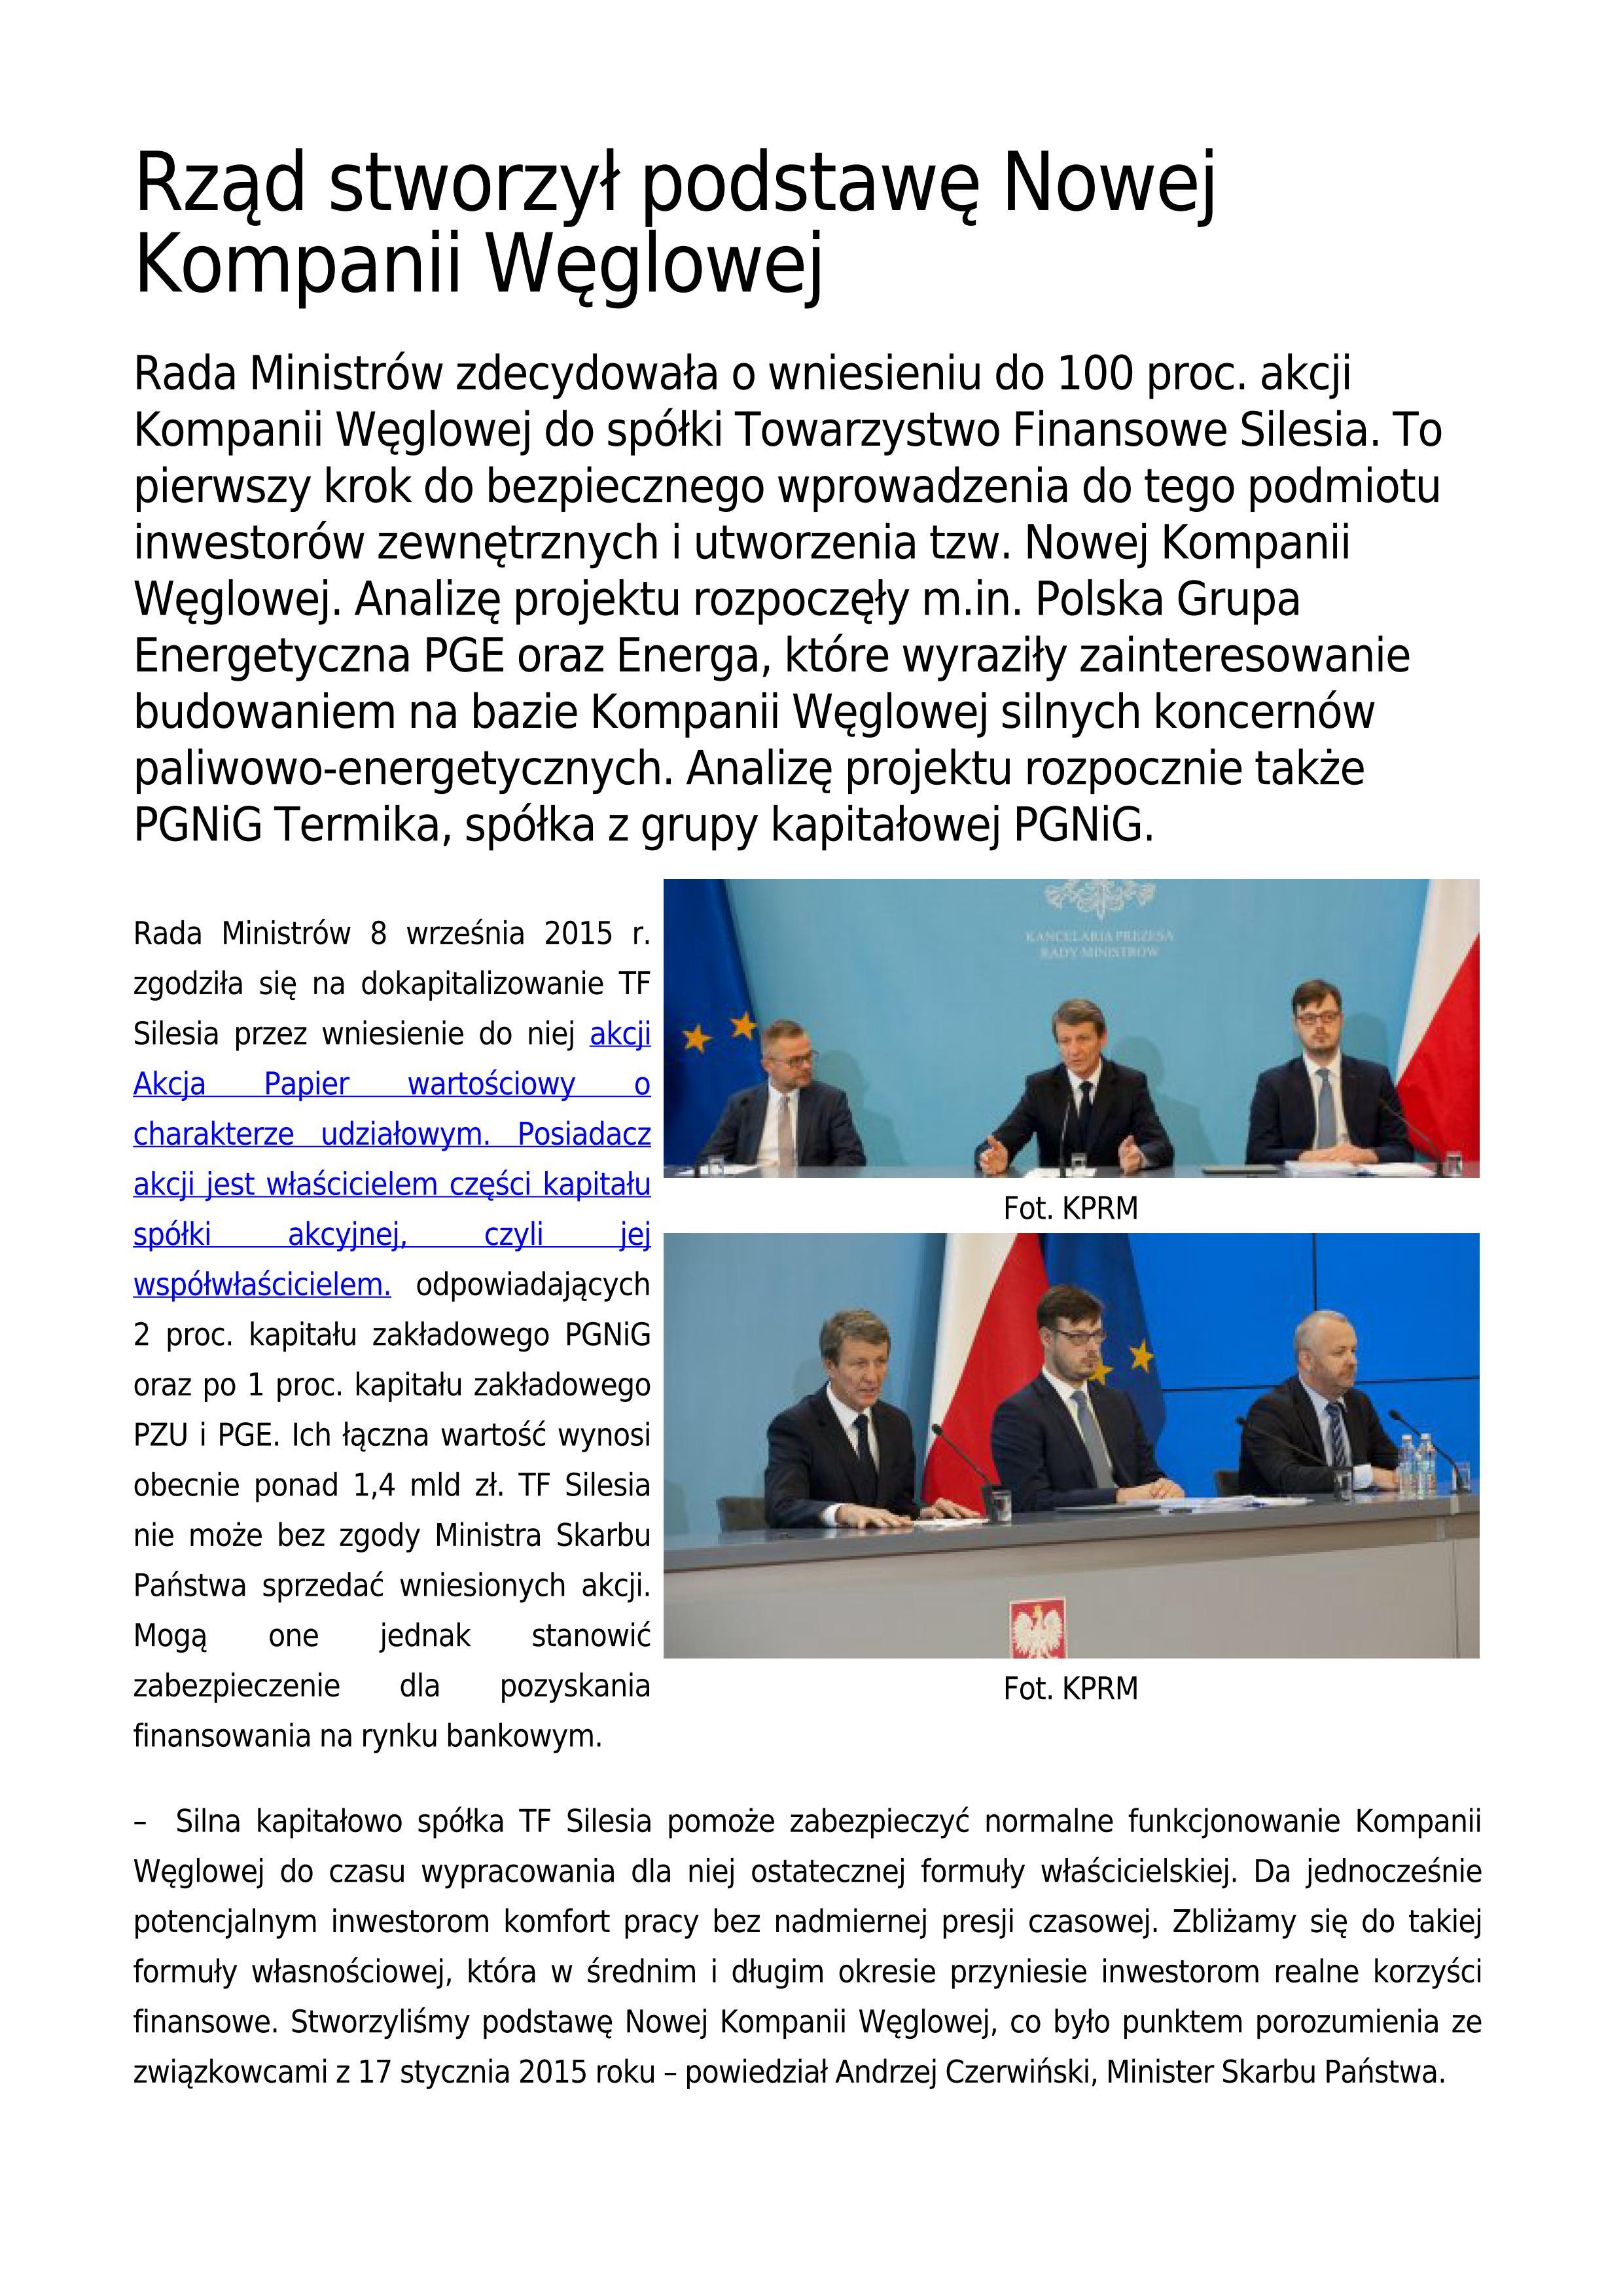 Nowa-Kompania-30-09-2015